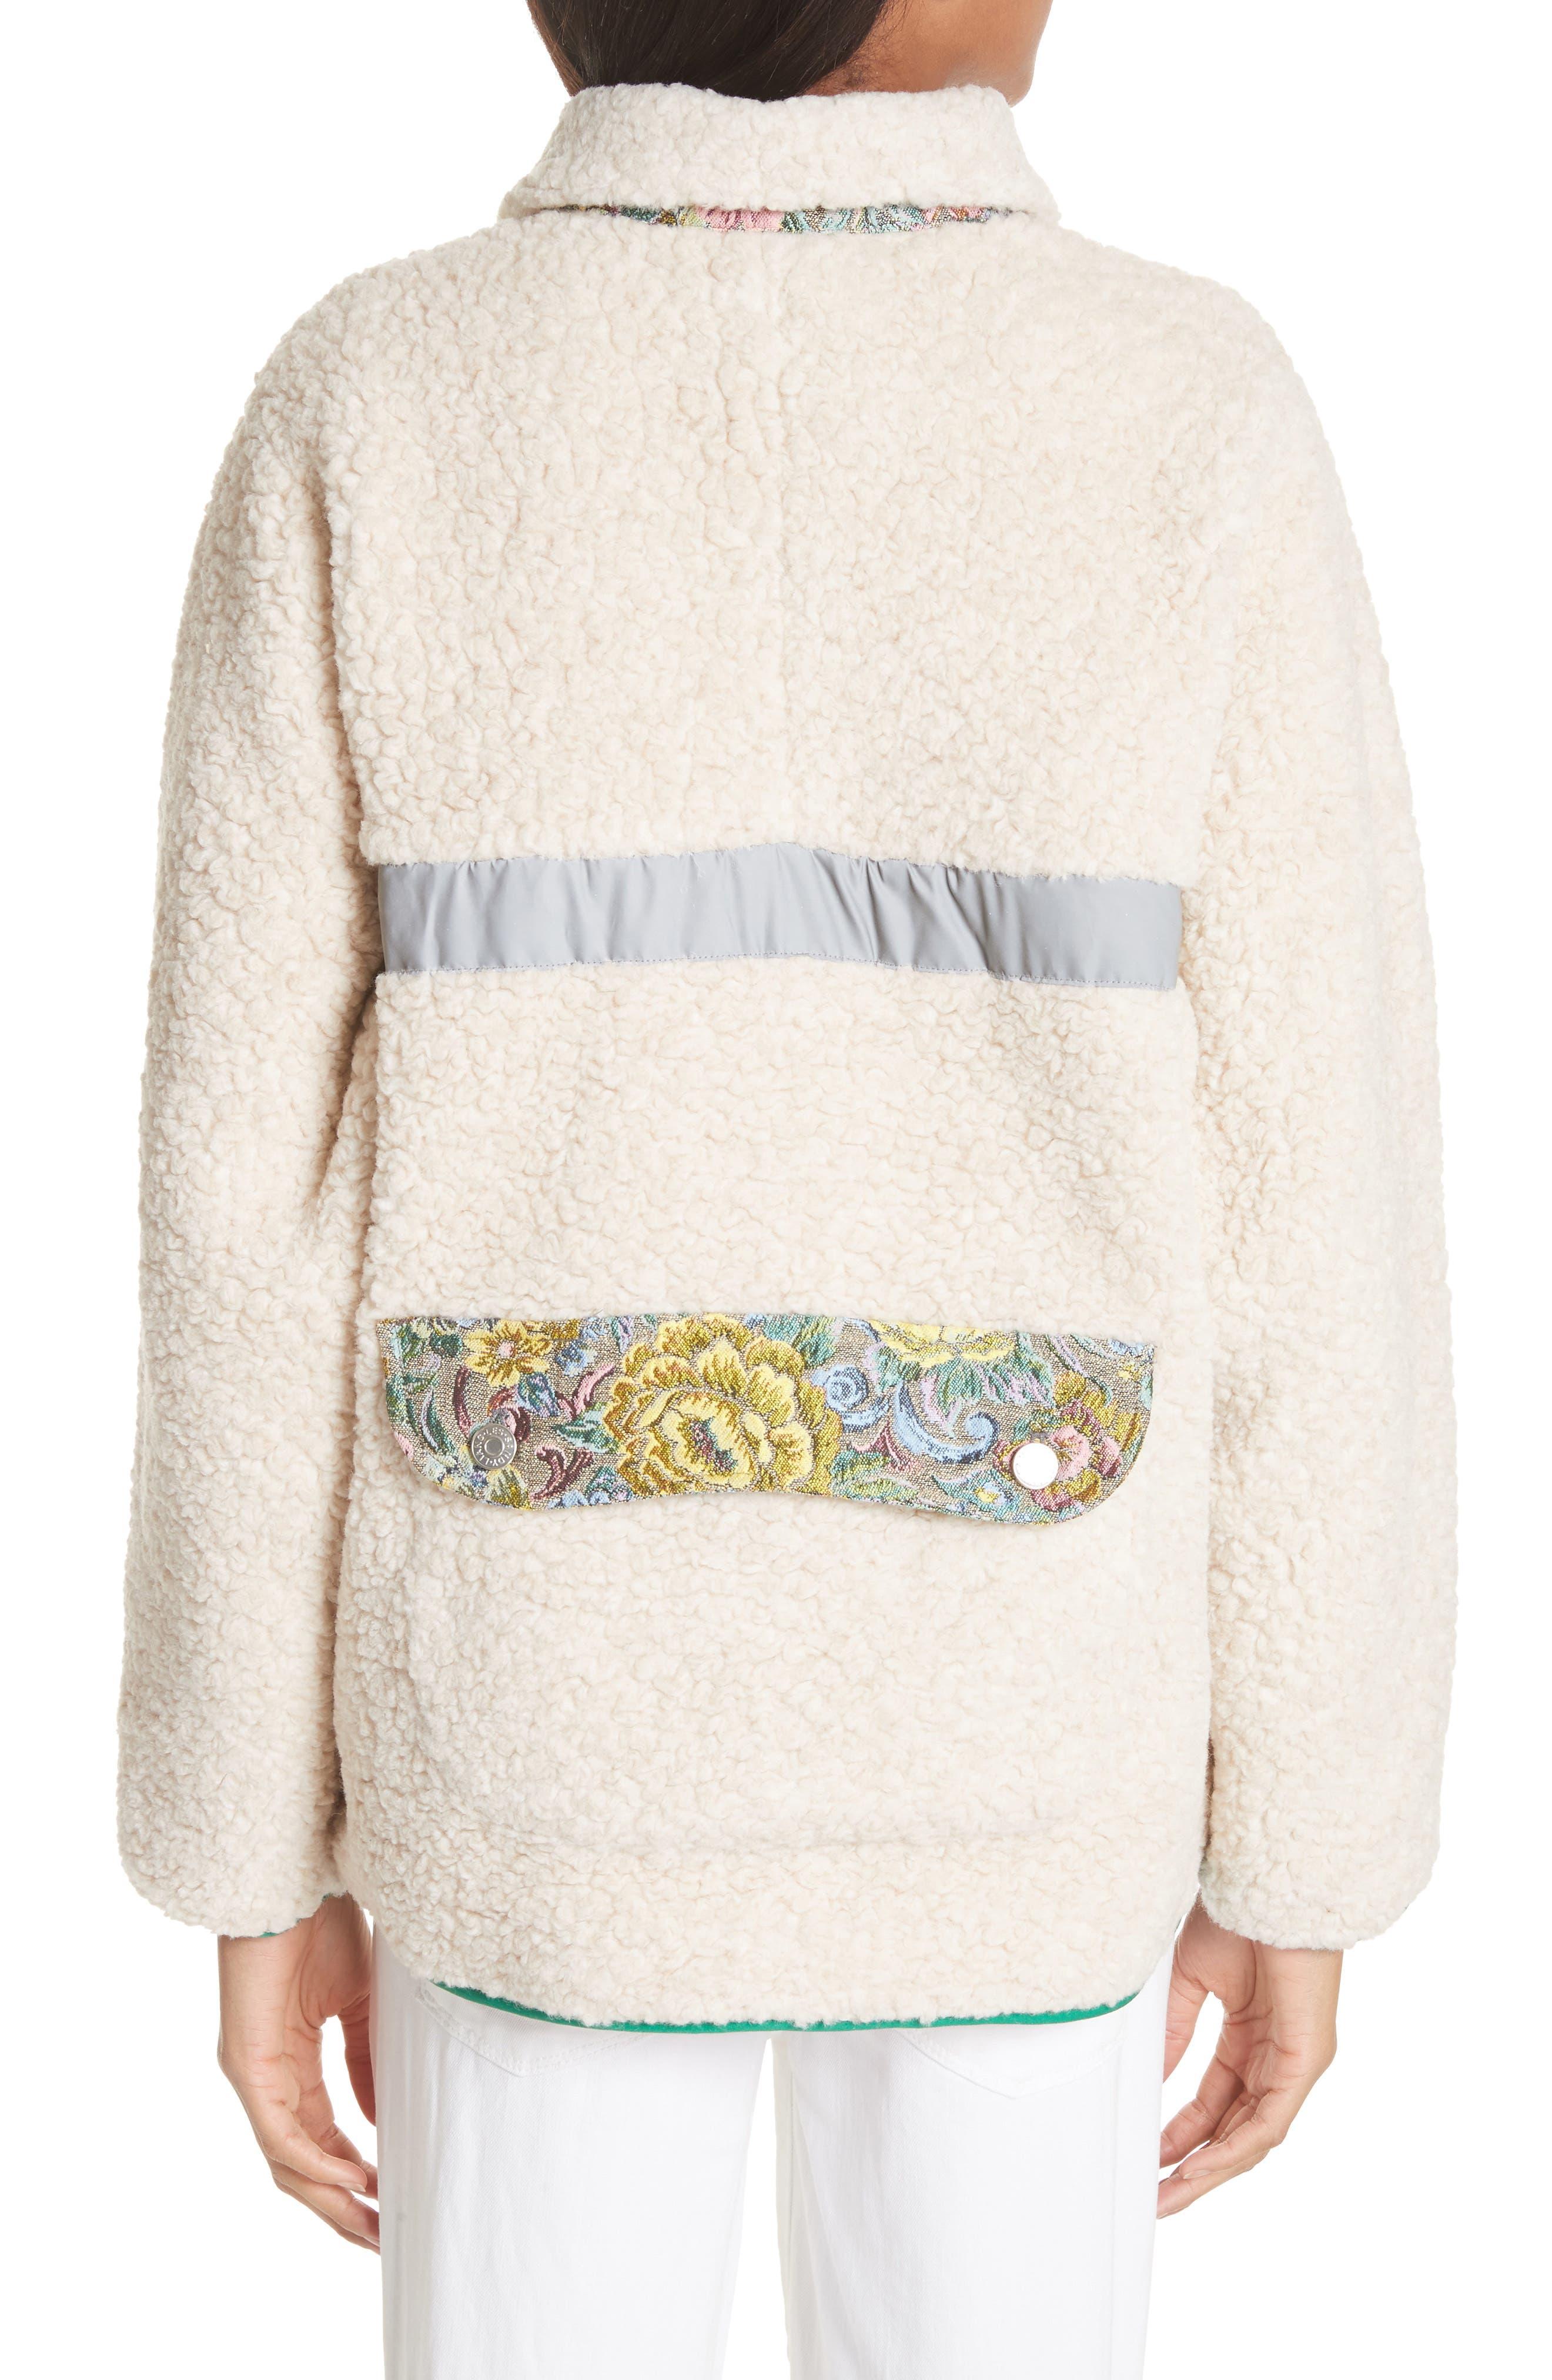 Bayside Floral Trim Fleece Jacket,                             Alternate thumbnail 2, color,                             900